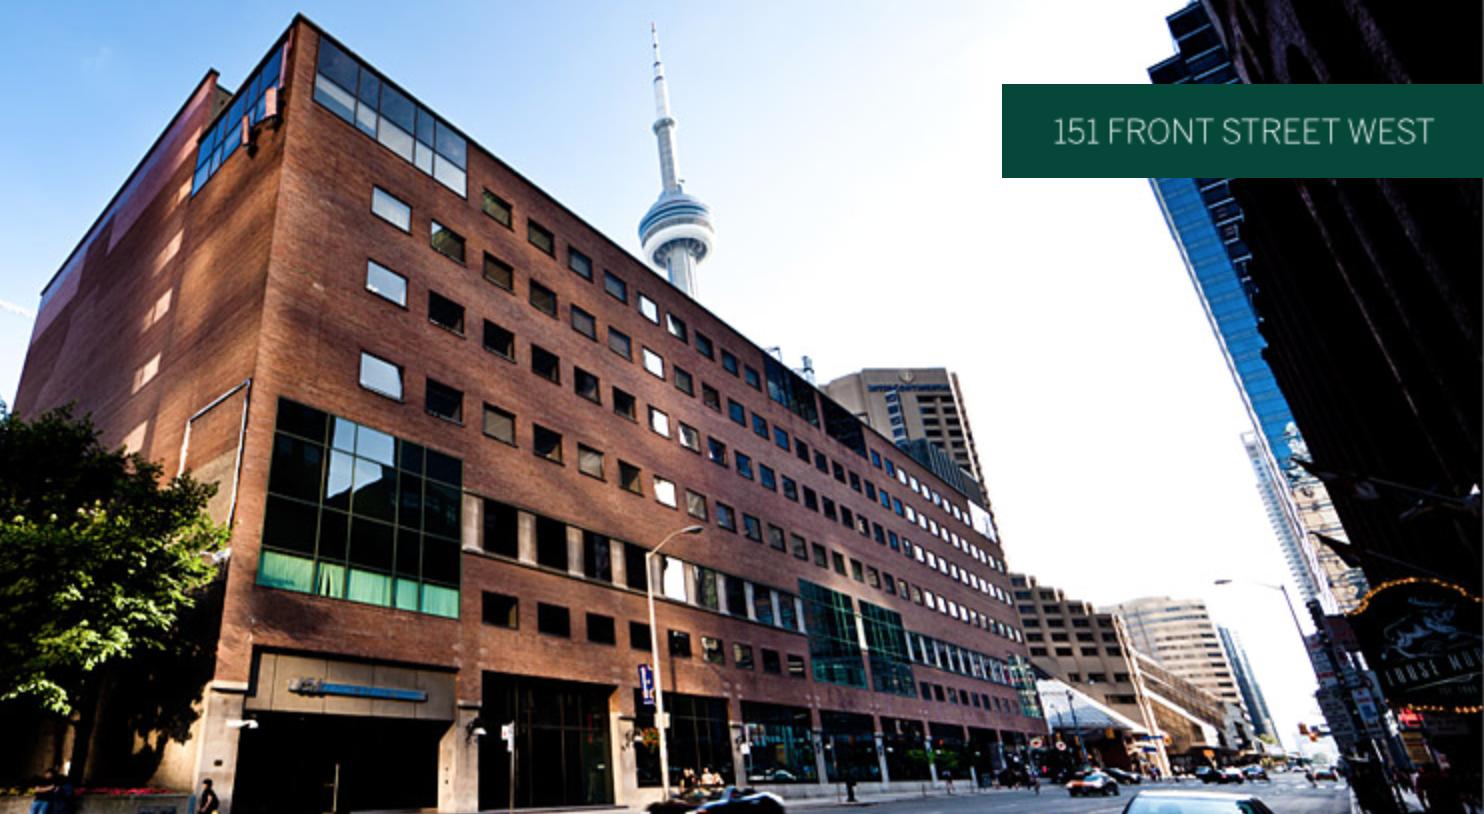 Canada's Carrier Hotel: http://www.151frontstreet.com